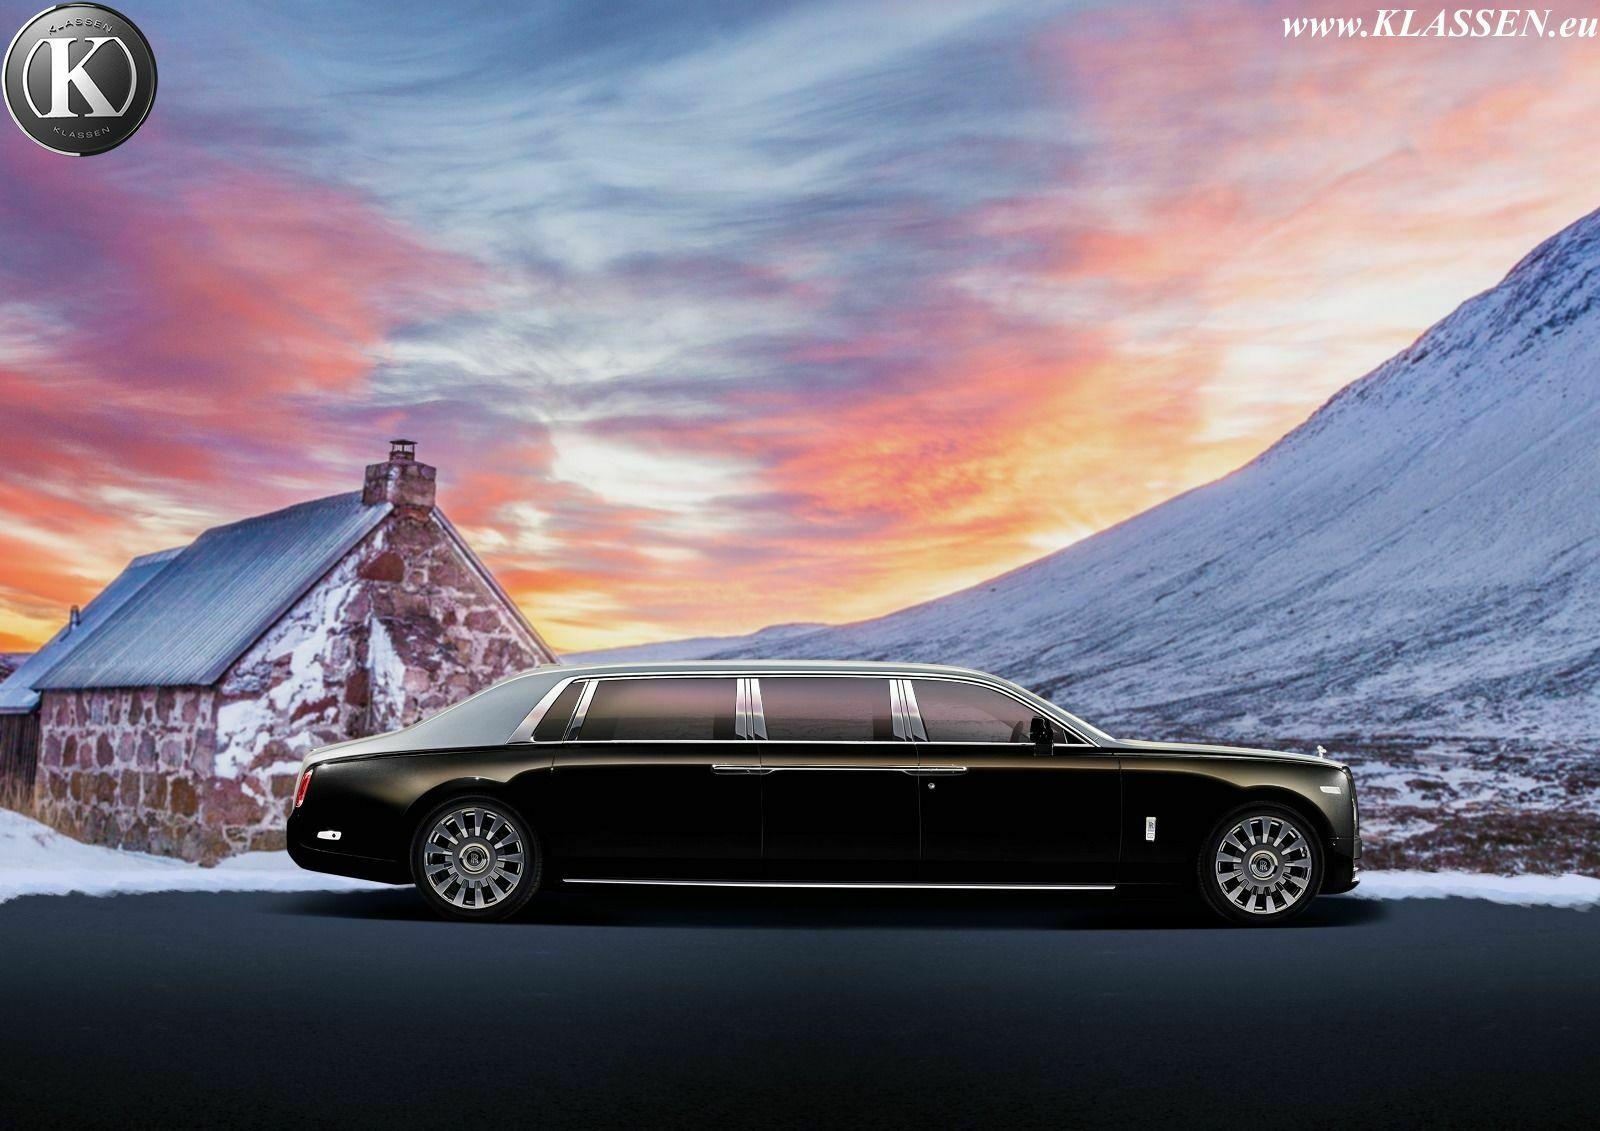 Rolls-Royce-Phantom-by-Klassen-3